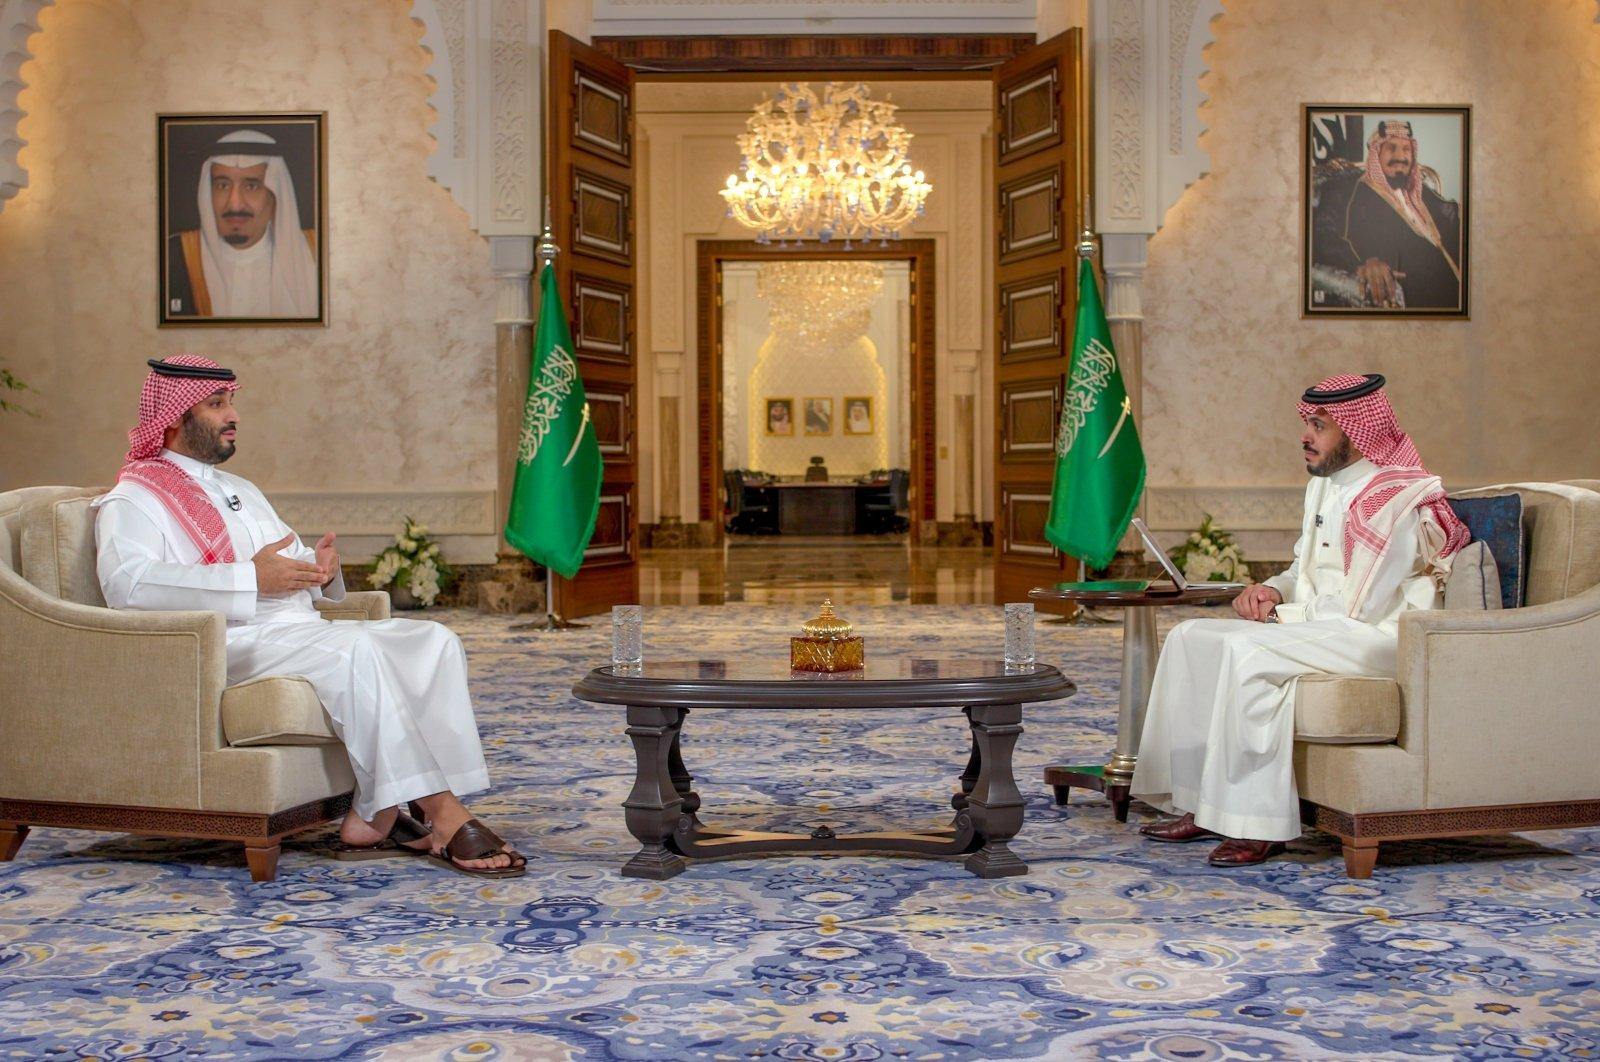 Saudi Arabia's Crown Prince Mohammed bin Salman (L) speaks during an interview, Riyadh, Saudi Arabia, April 28, 2021. (AA Photo)